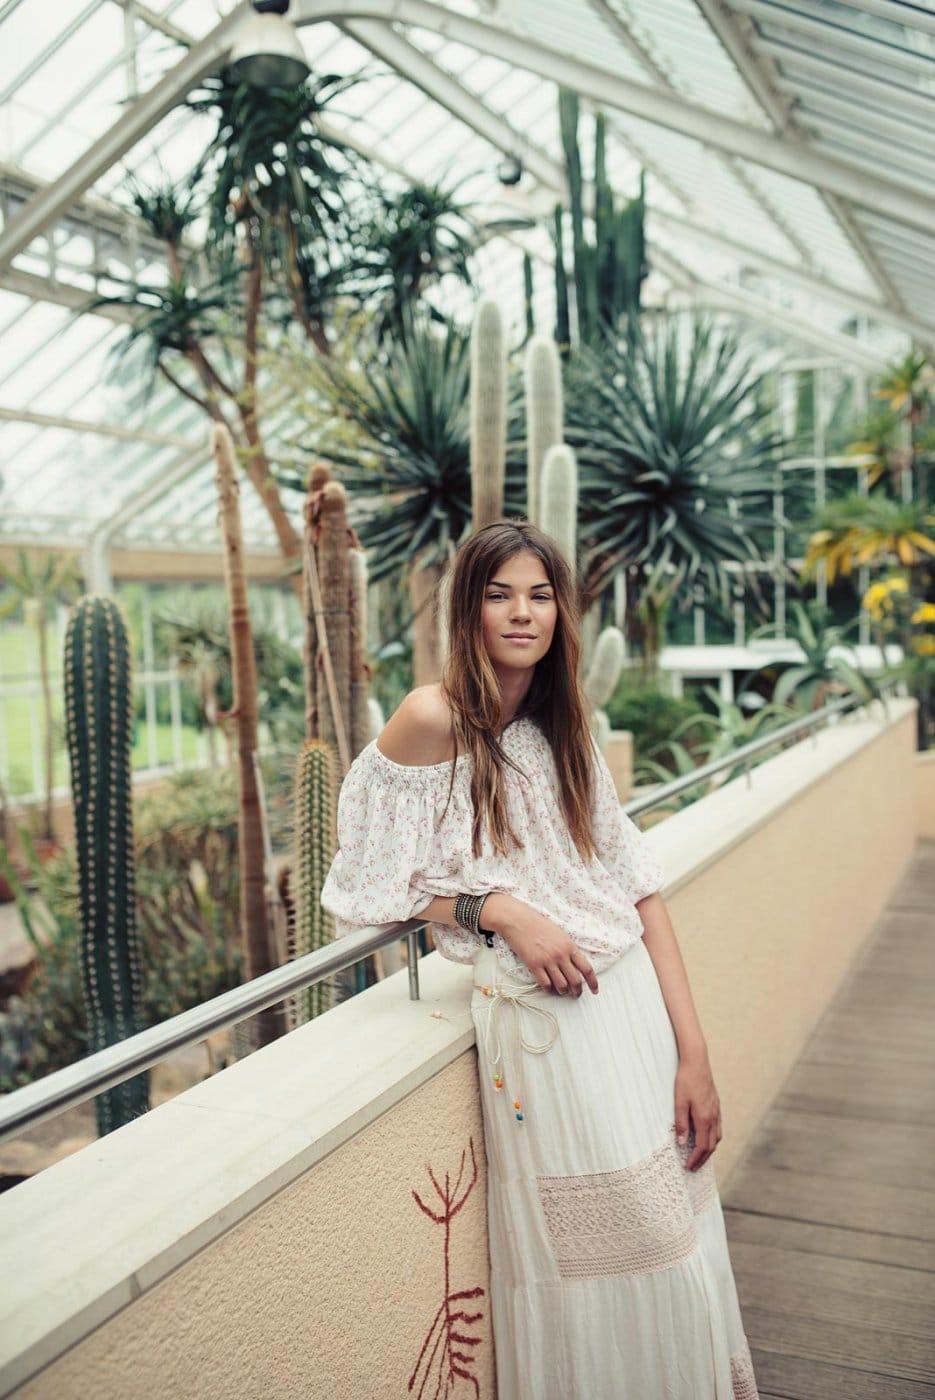 Portrait Photography By Anastasia Vervueren Plantentuin Meise Tropical Vibes